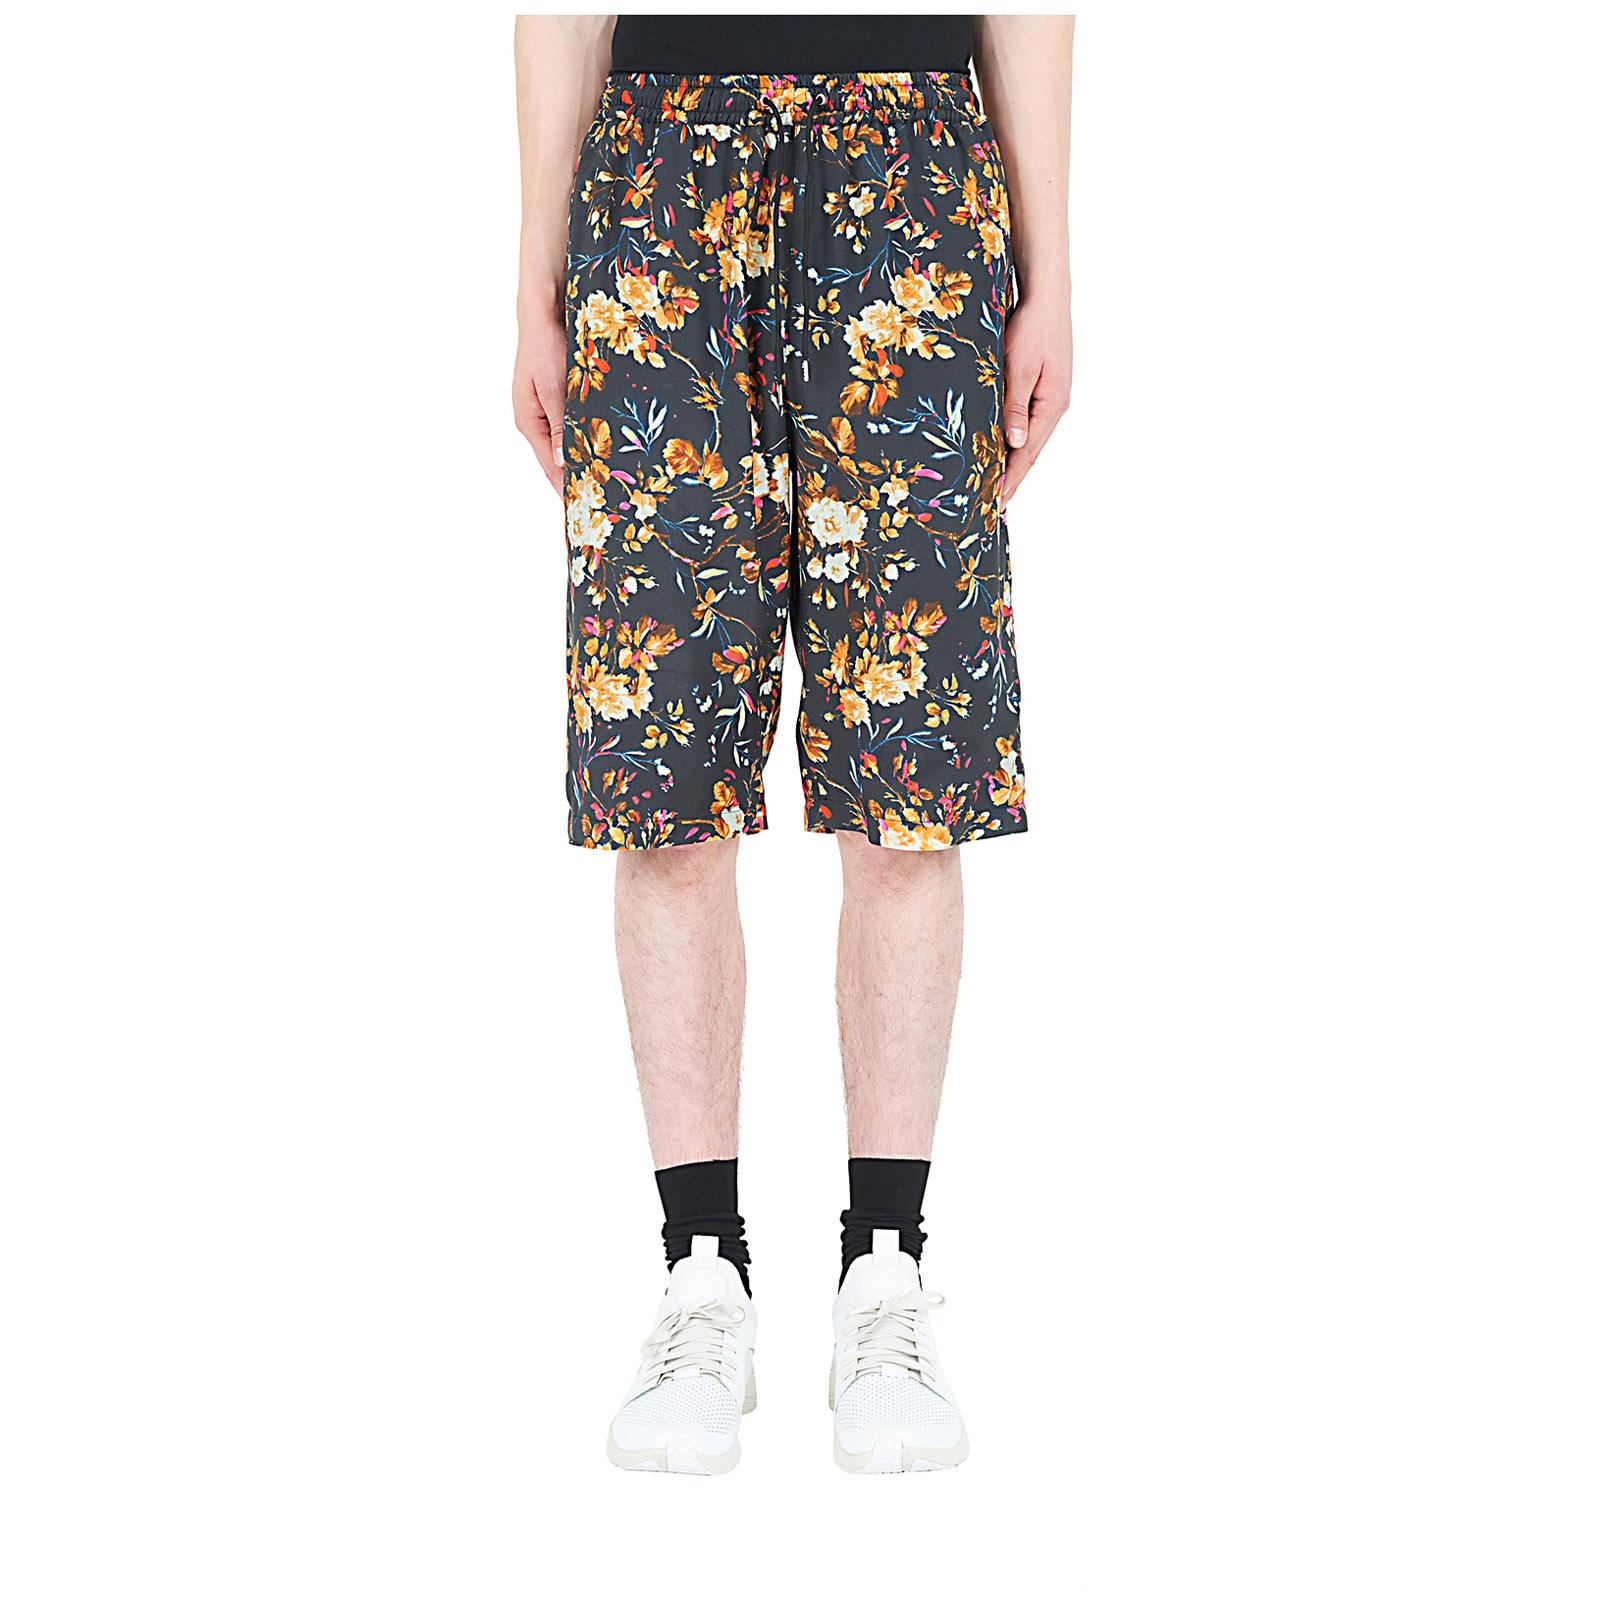 Bermuda shorts pantaloncin hombre